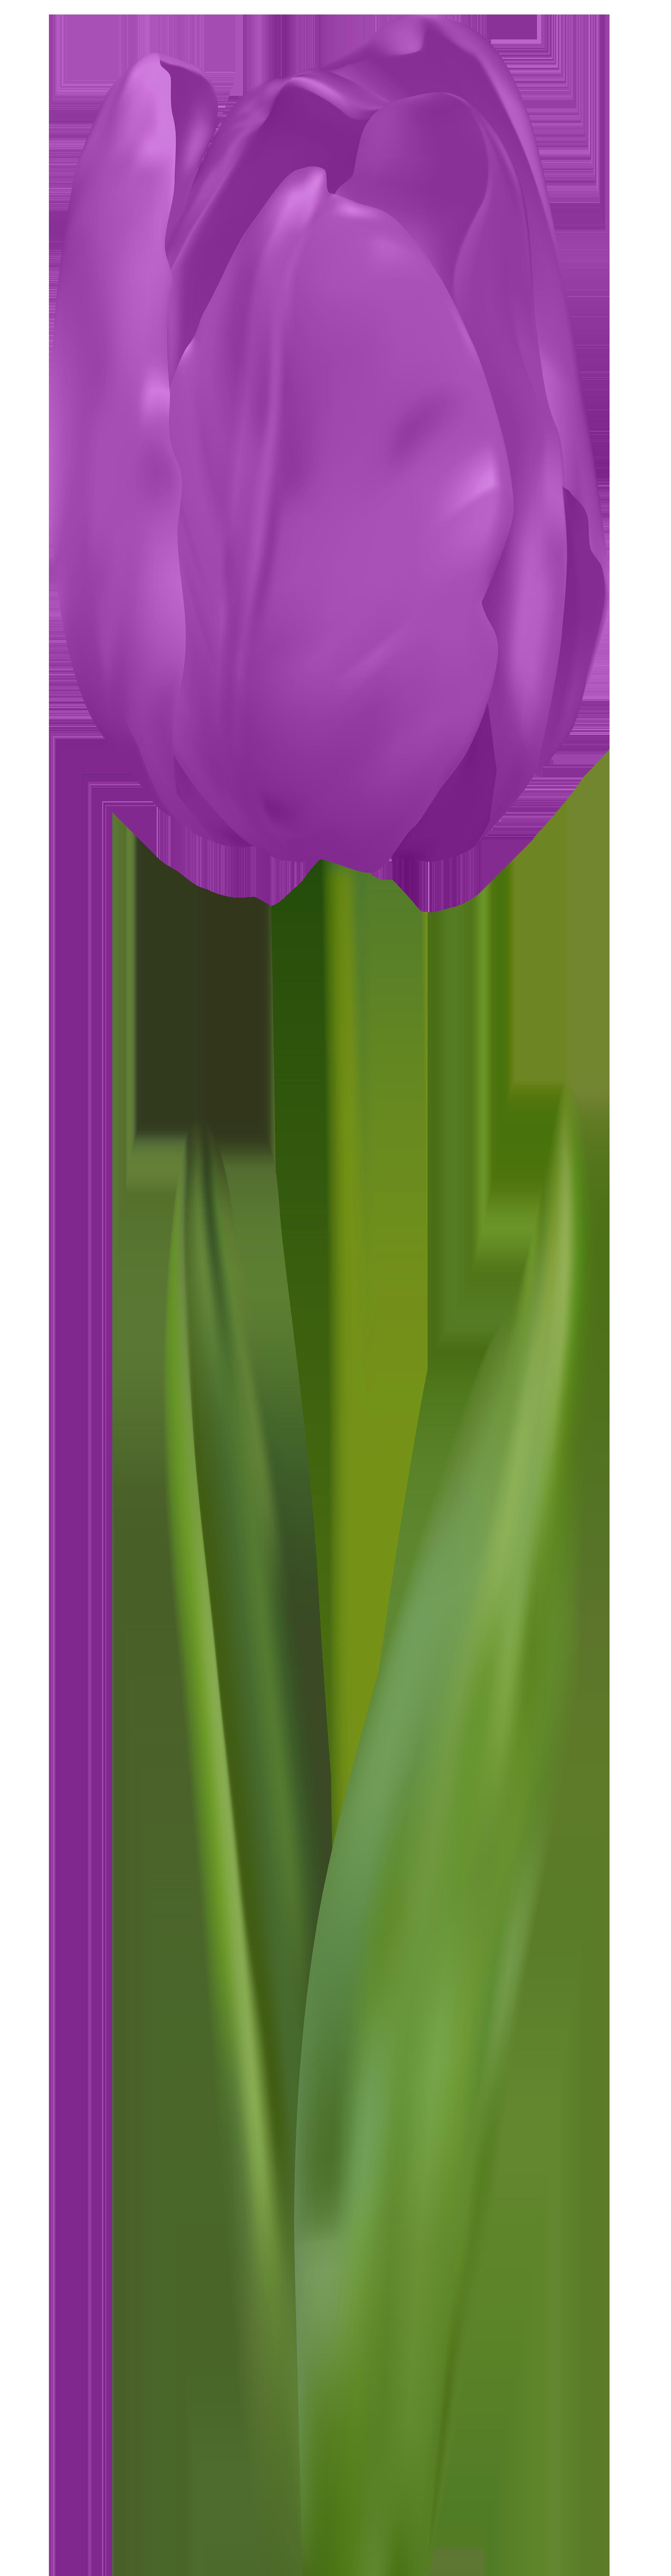 Purple Tulip PNG Clip Art Image.